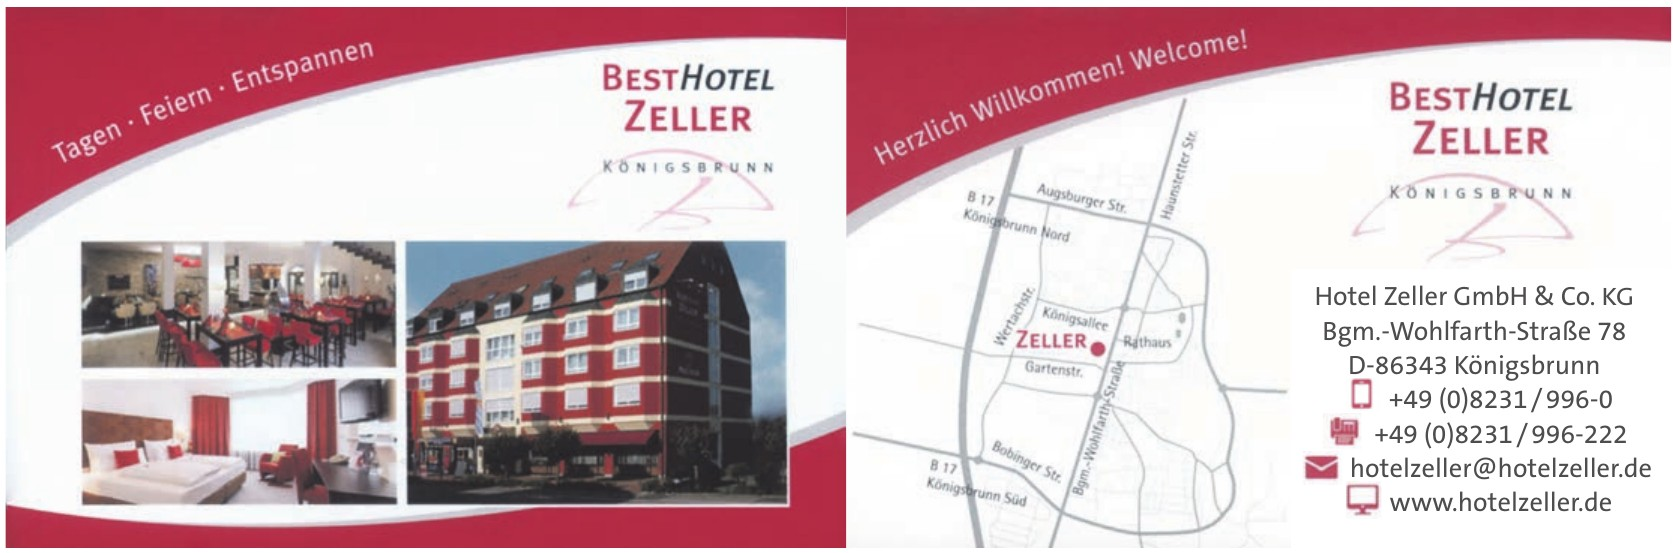 Hotel Zeller GmbH & Co. KG